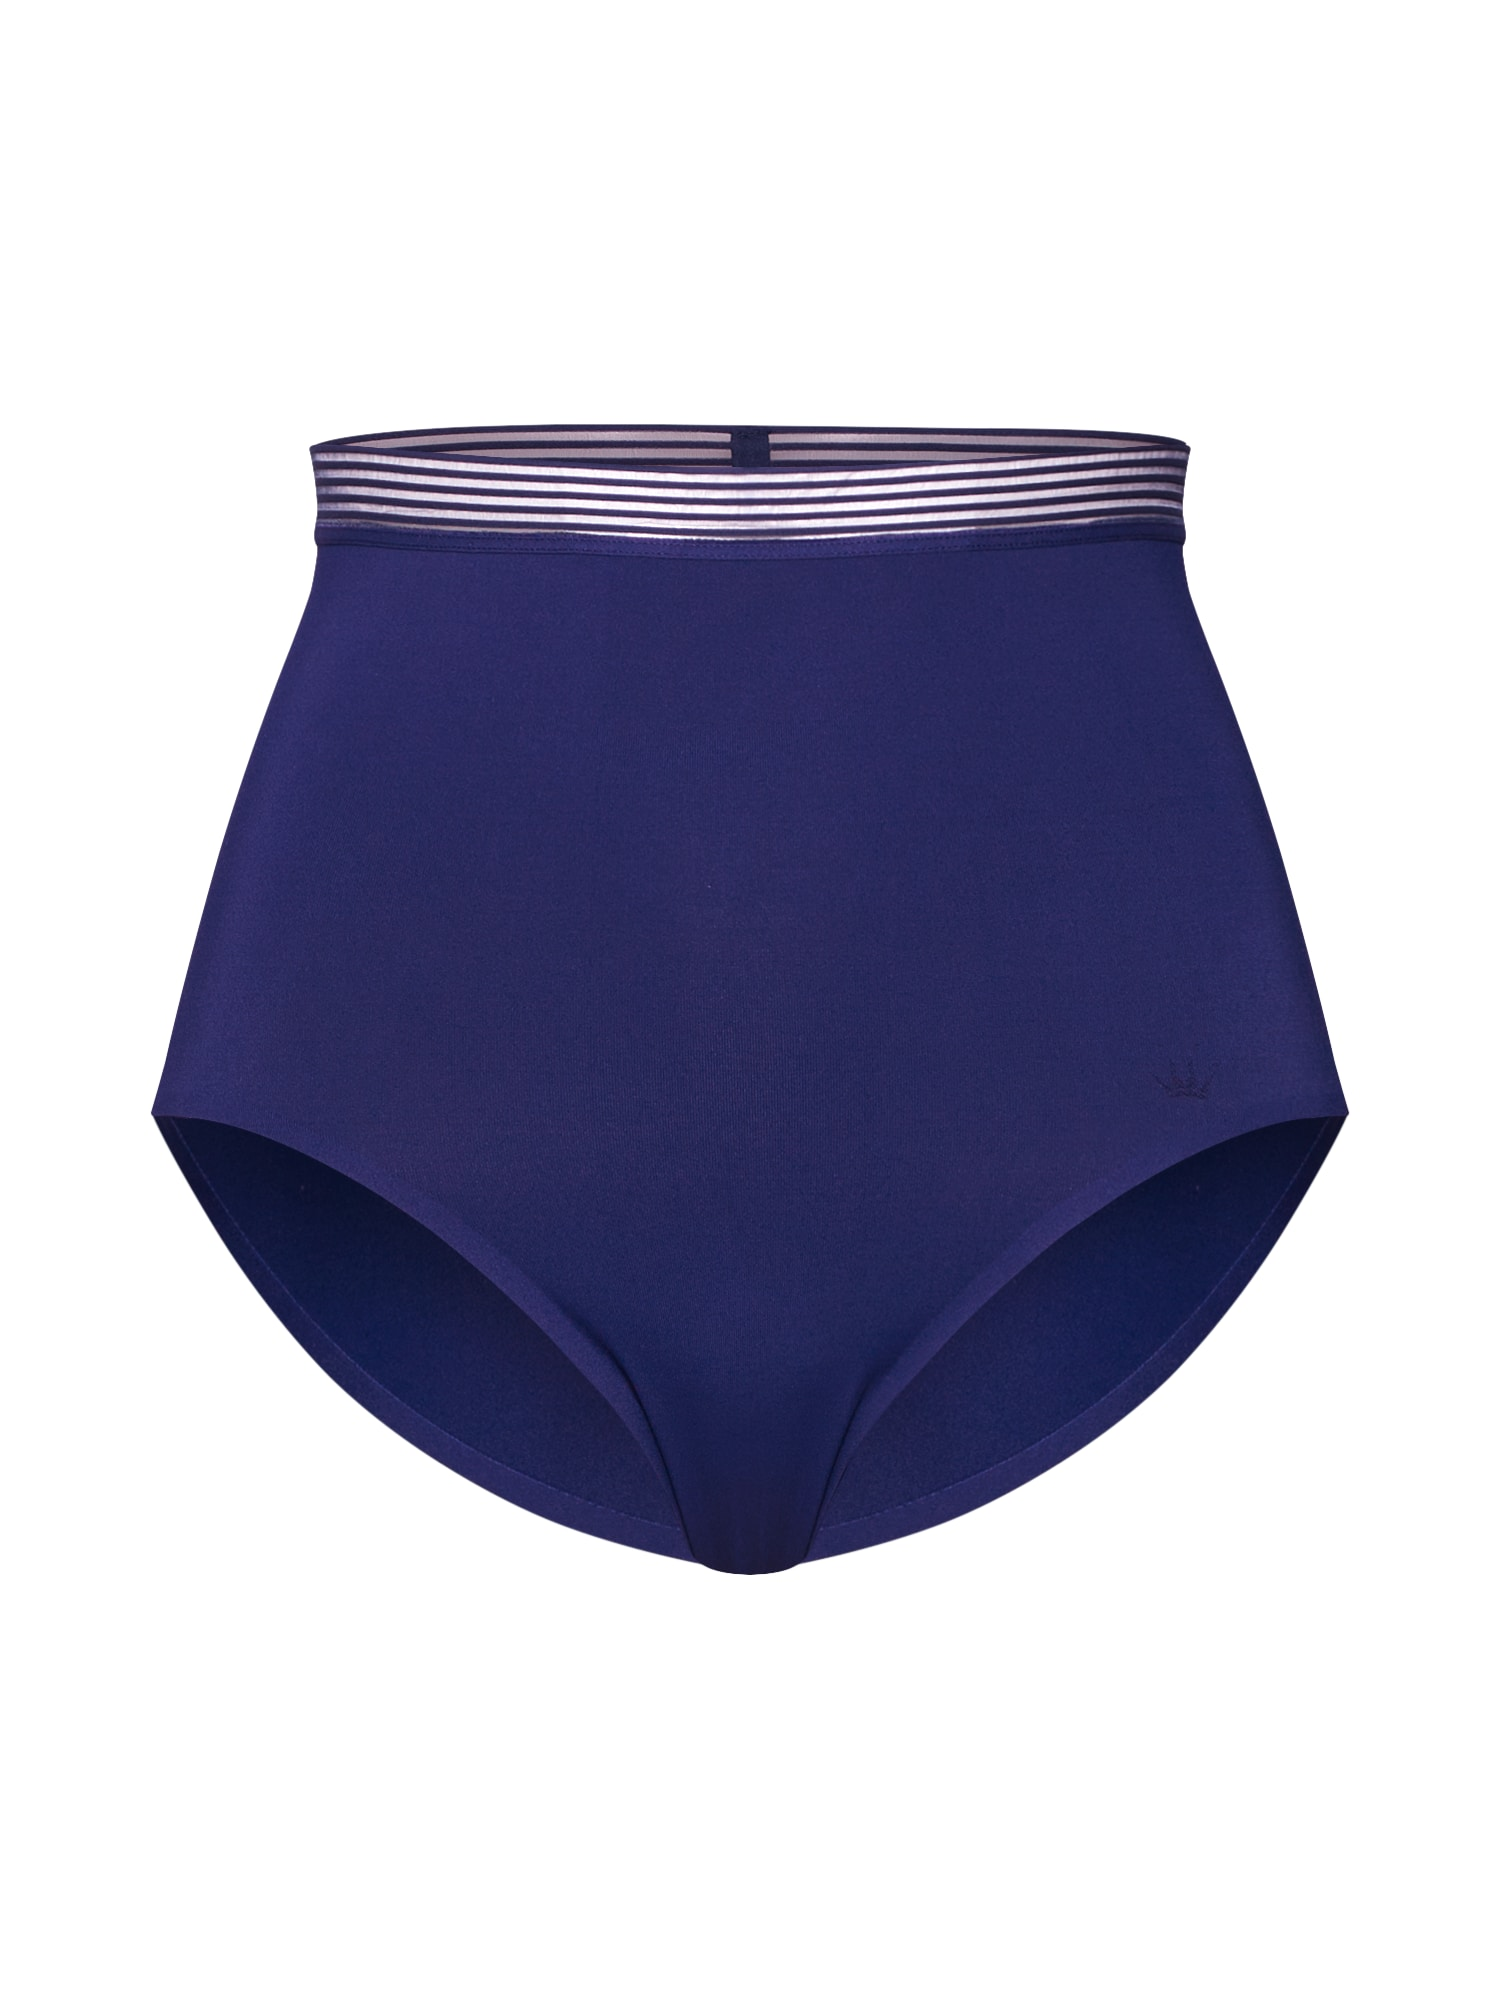 Kalhotky Infinite Sensation tmavě modrá TRIUMPH